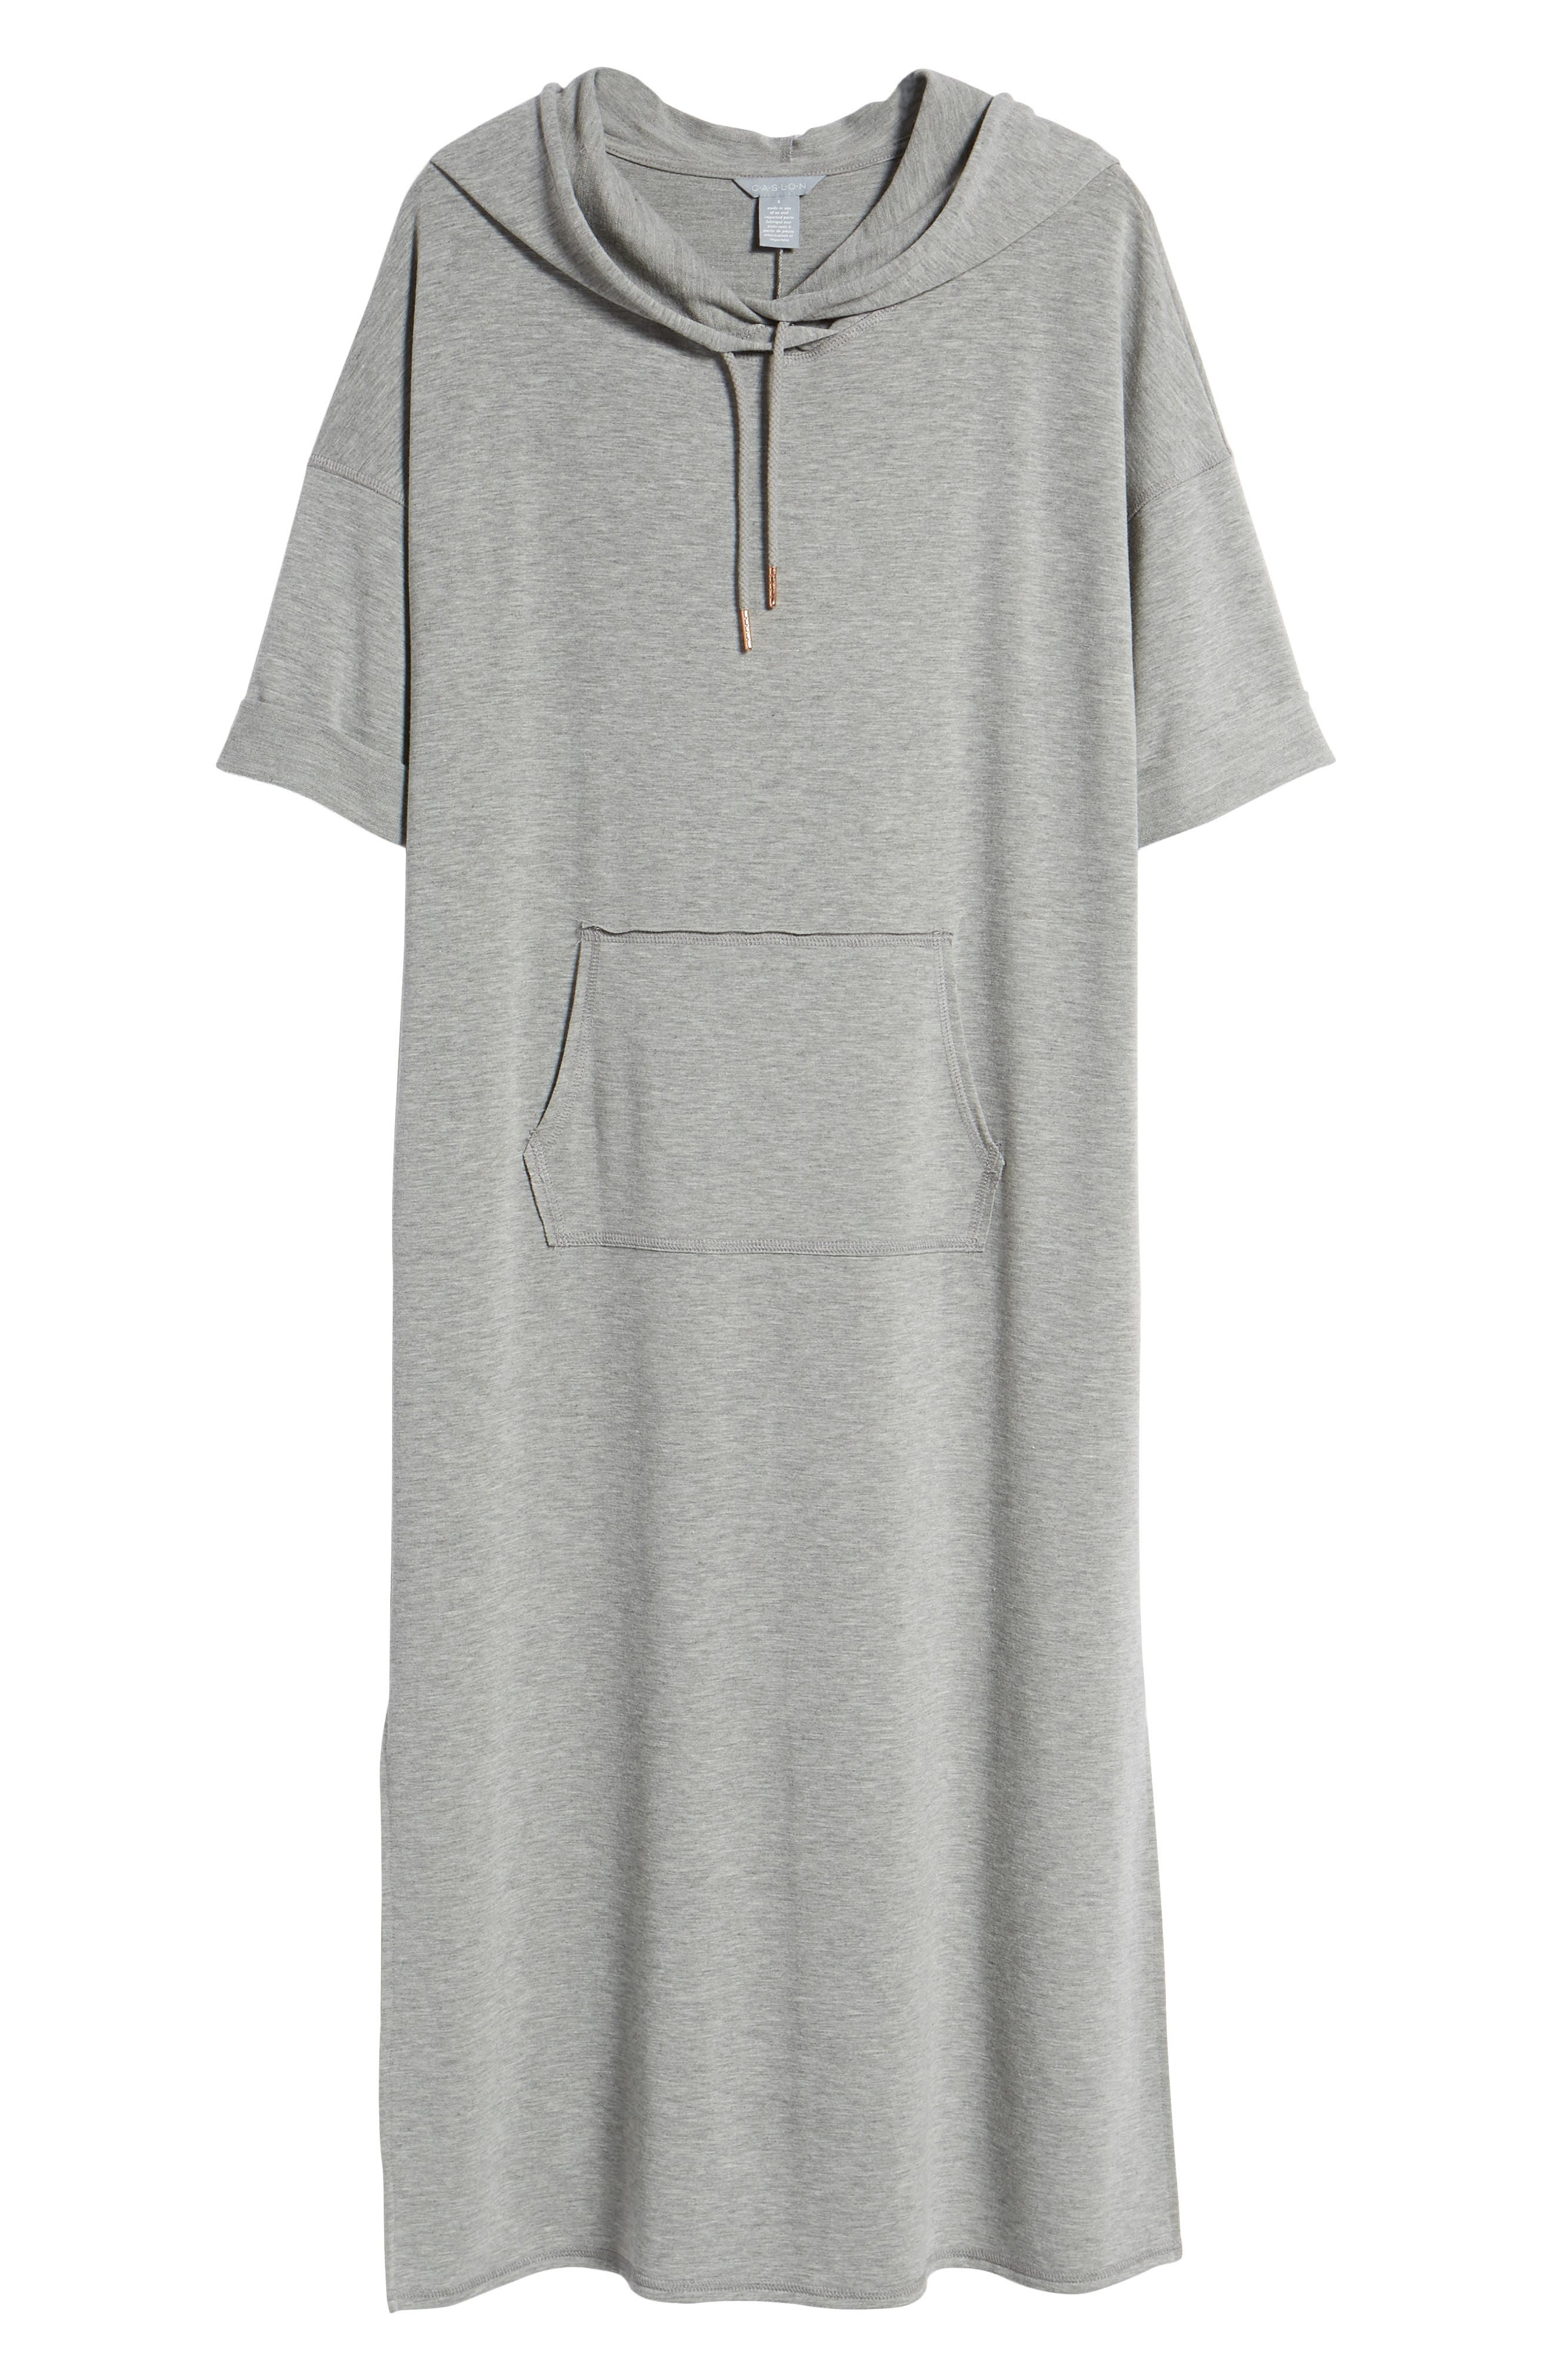 Off-Duty Knit Maxi Dress,                             Alternate thumbnail 7, color,                             Grey Heather